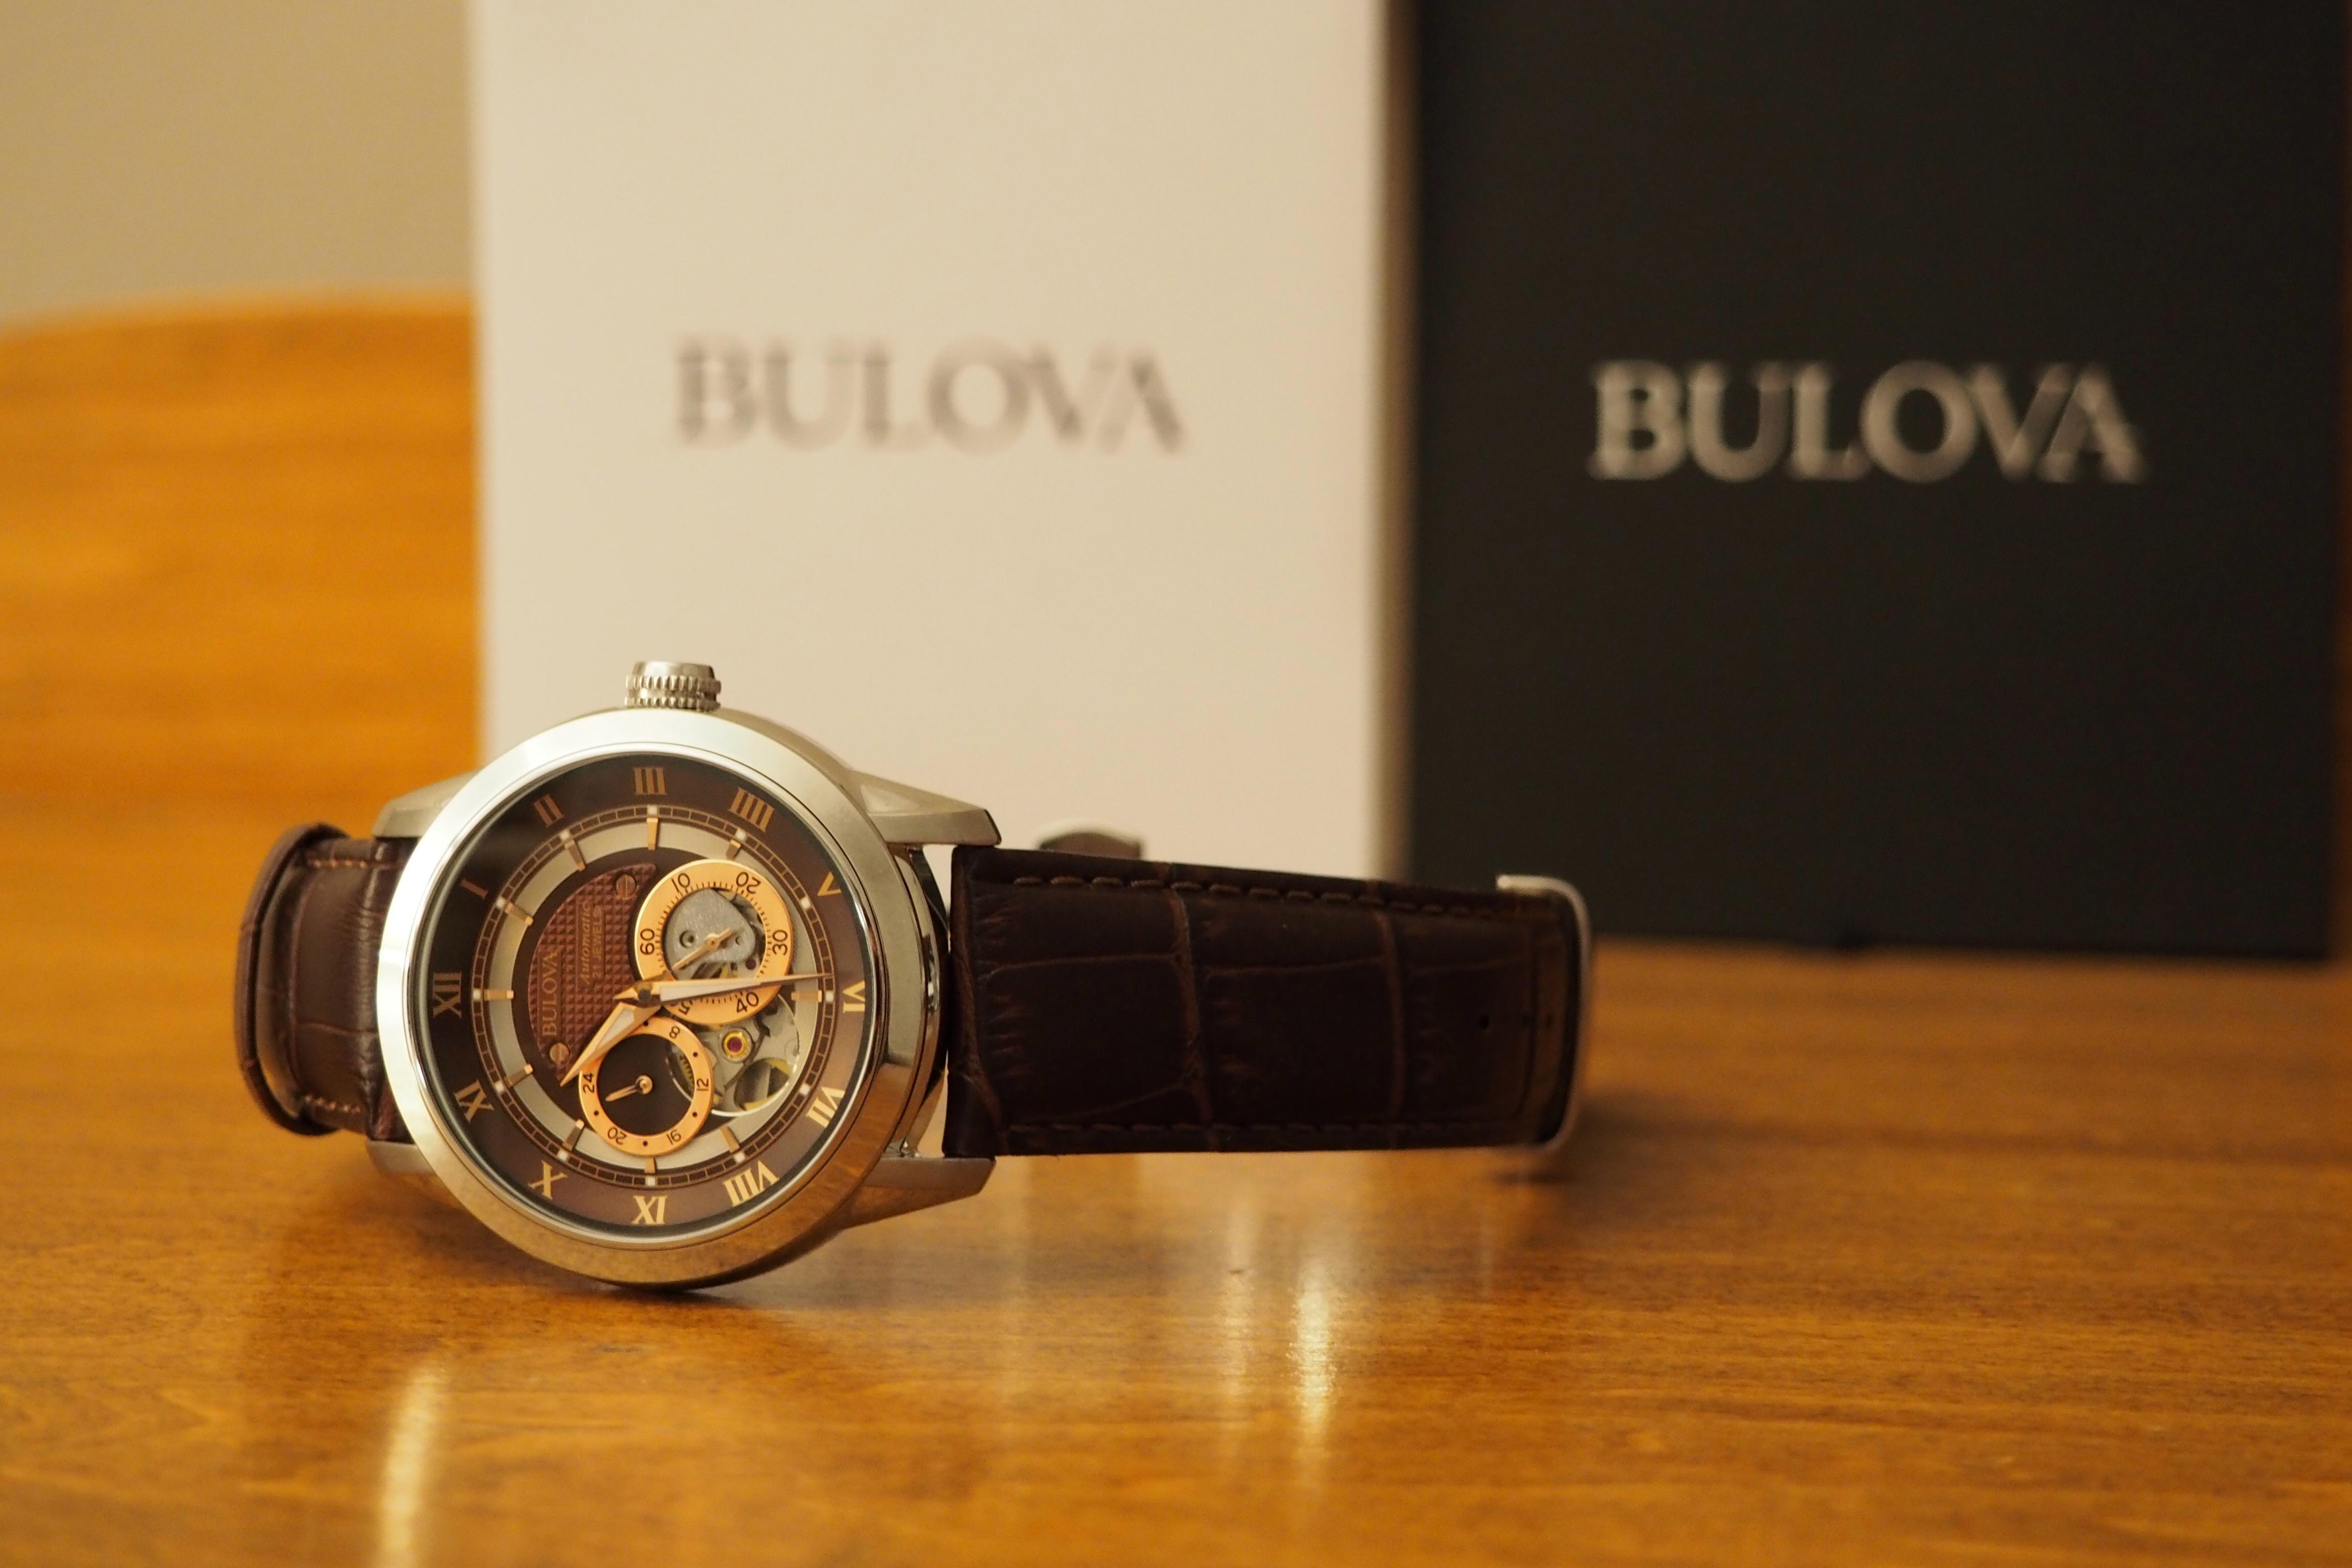 Bulova 96A120 Automatic Watch Review